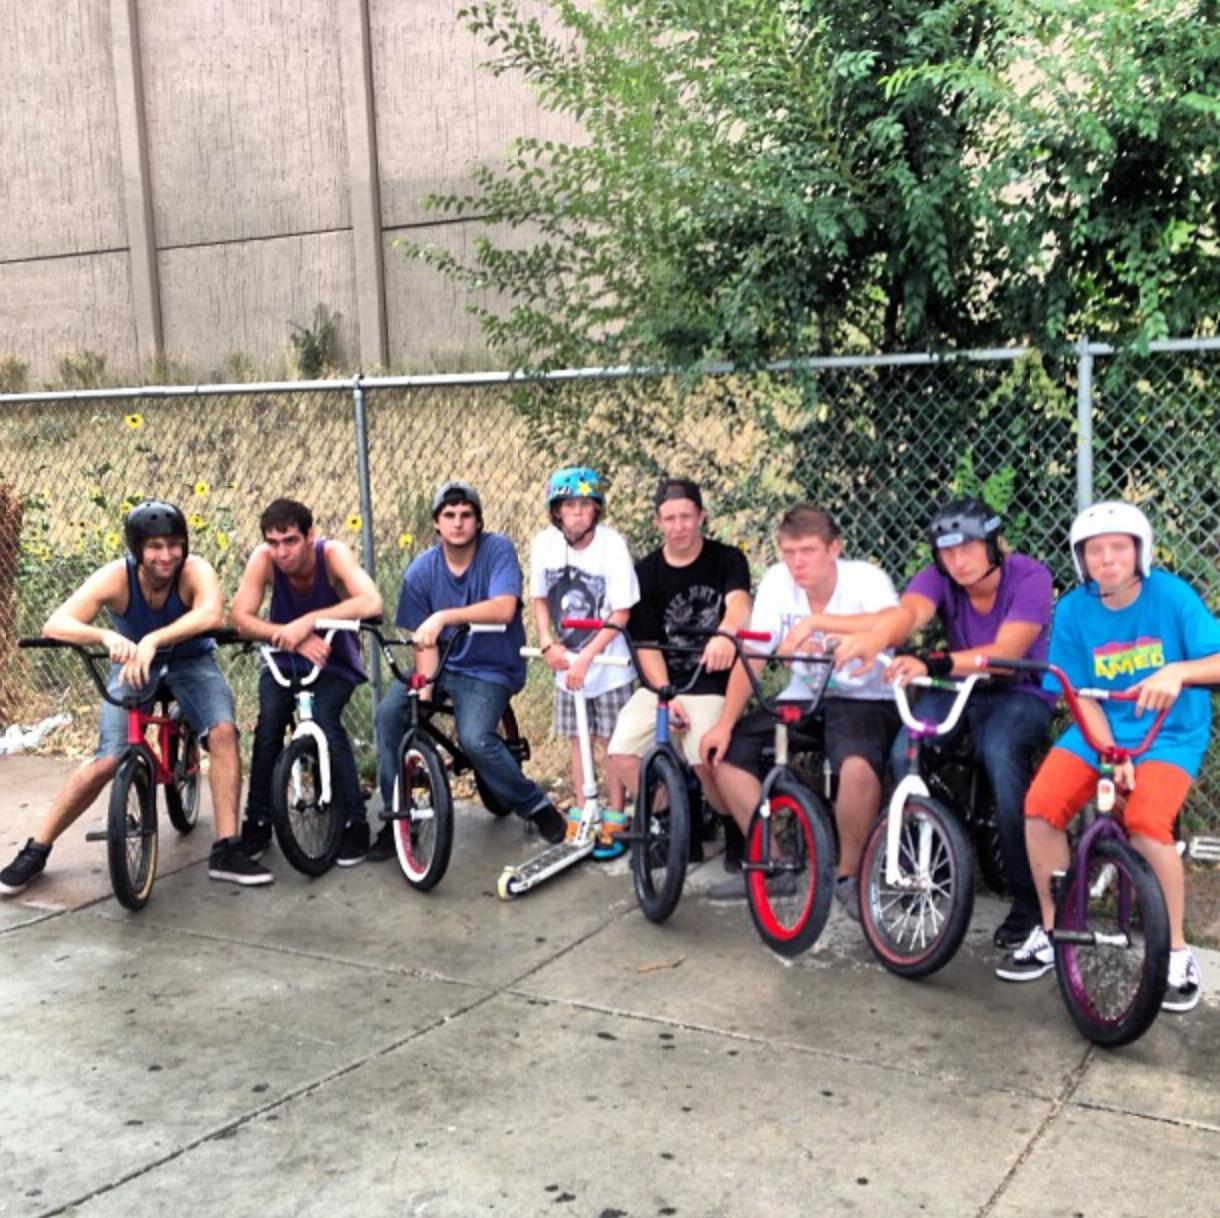 Josh and the SkateChurch boys!